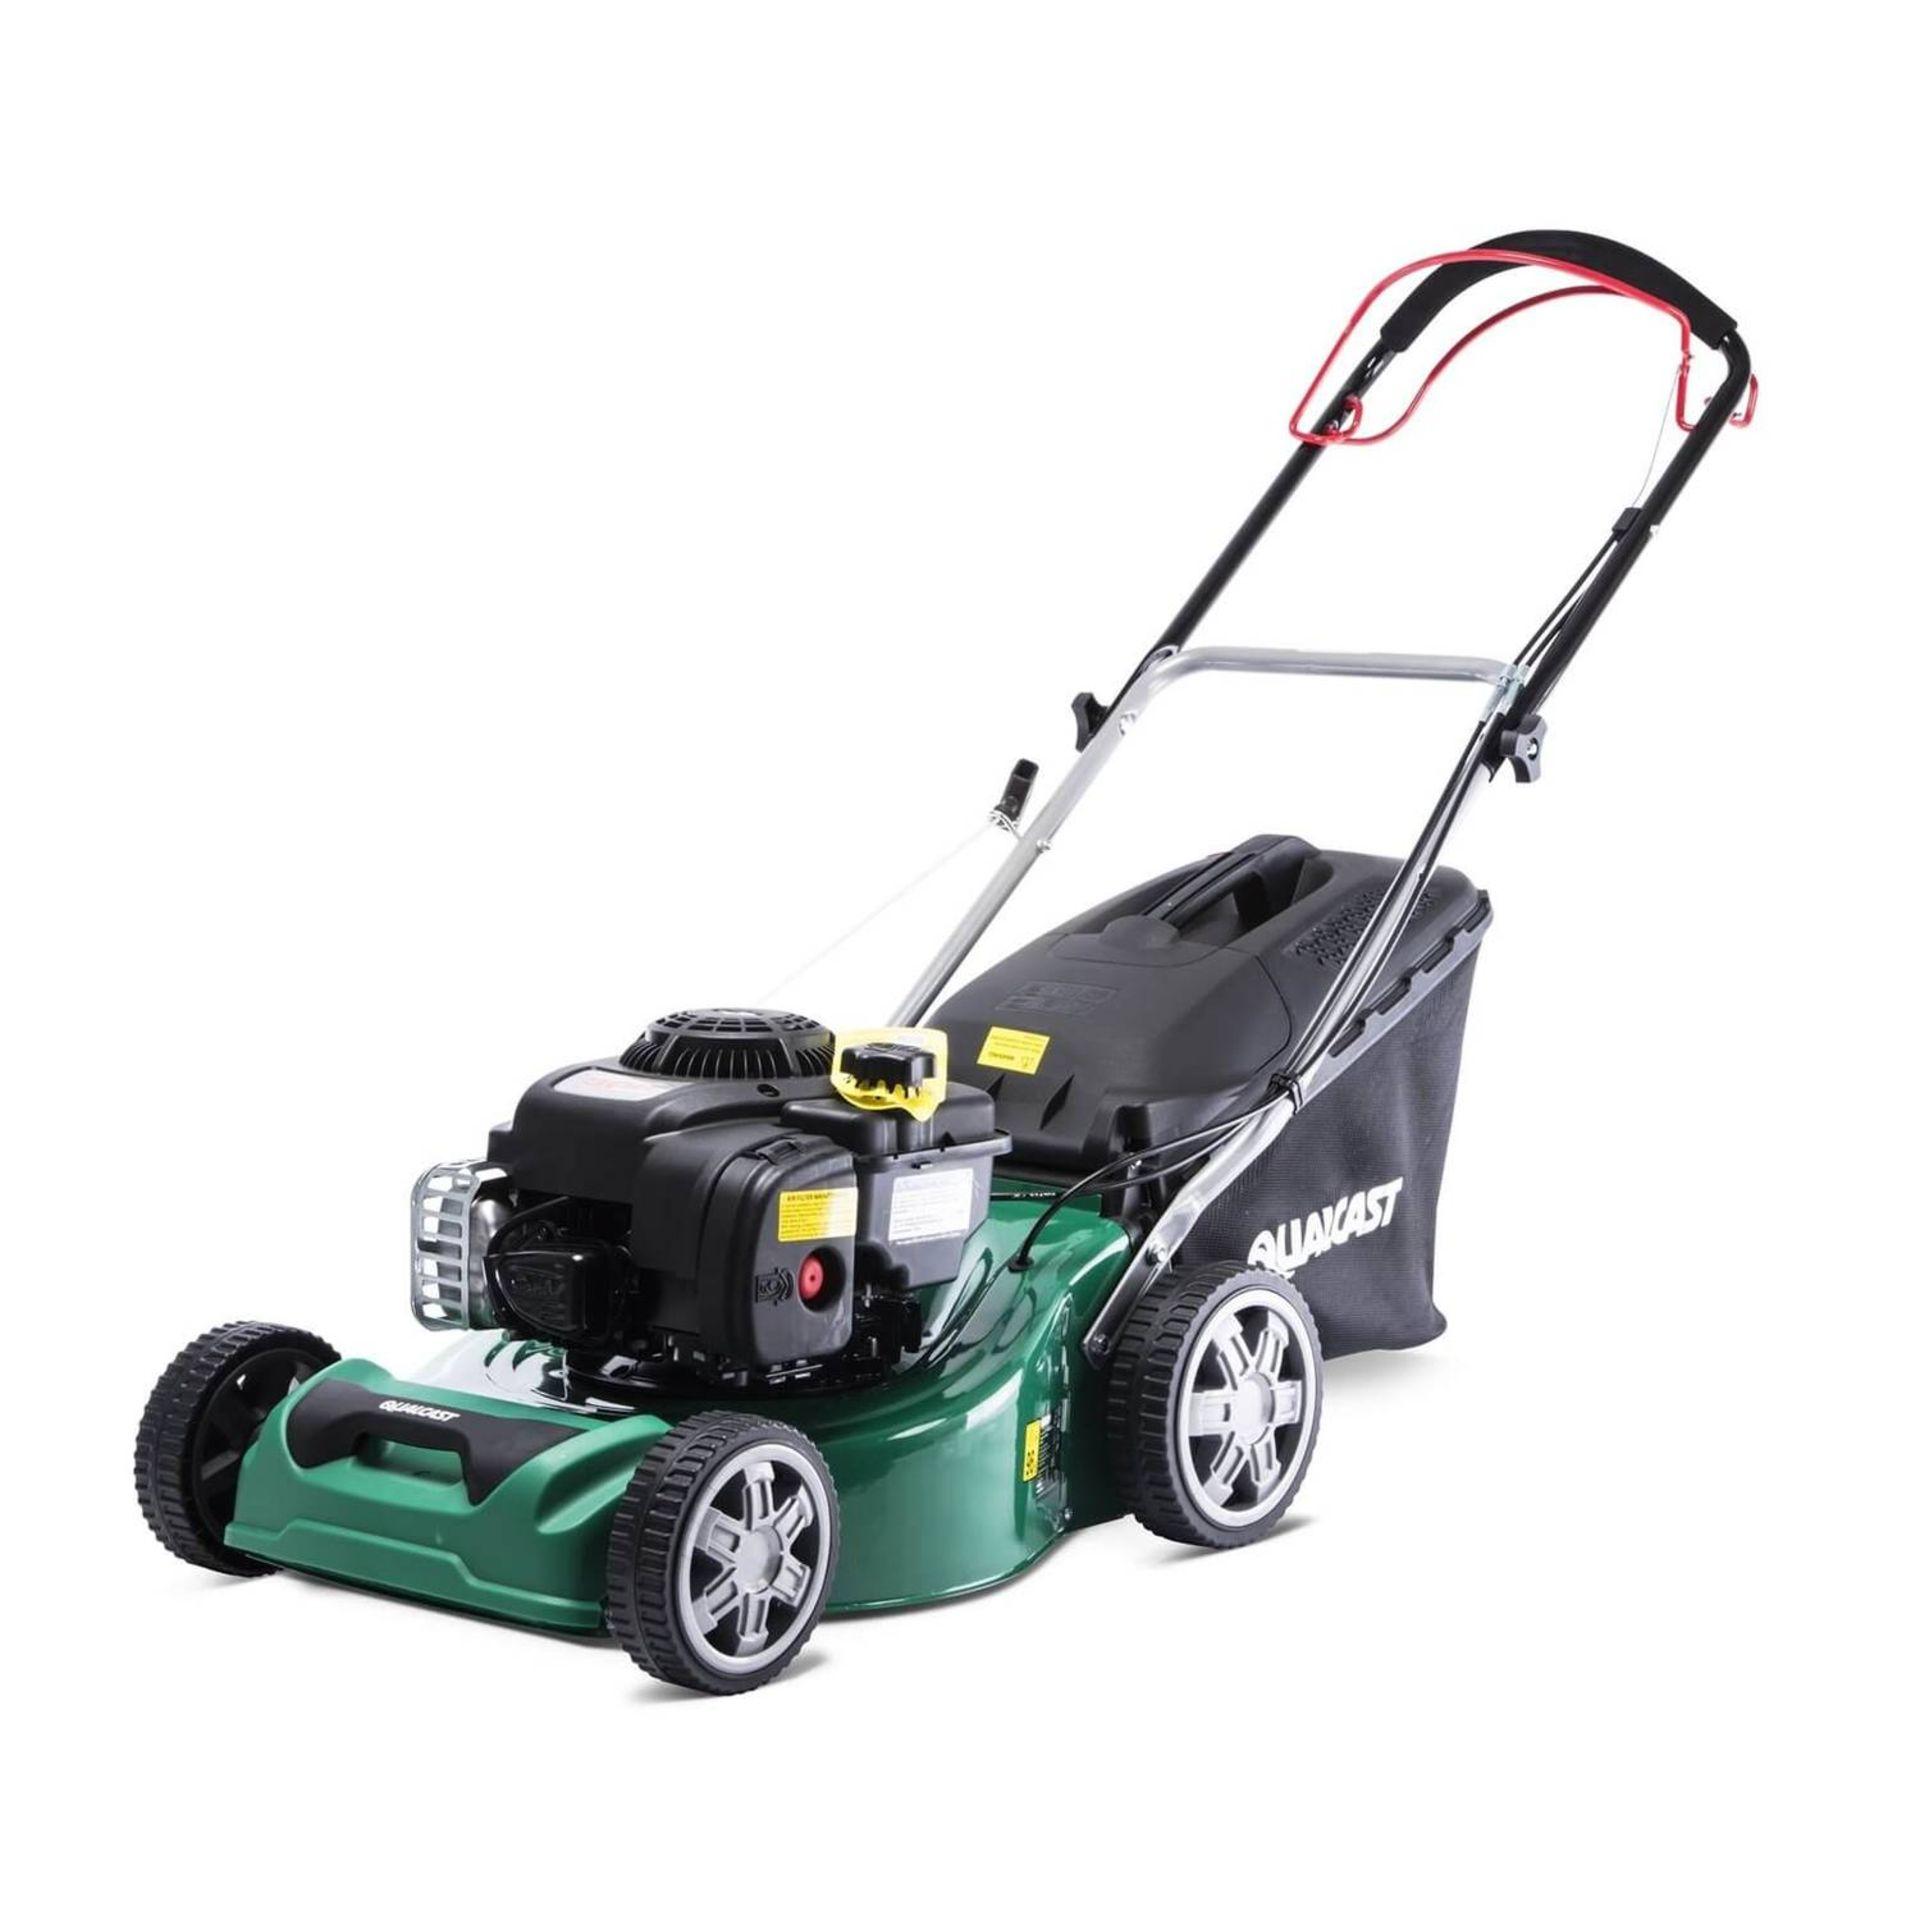 (P10) 1x Powerbase 41cm 125cc Push Petrol Rotary Lawn Mower (XSS41D) RRP £199. New, Clean Unused I - Image 2 of 8